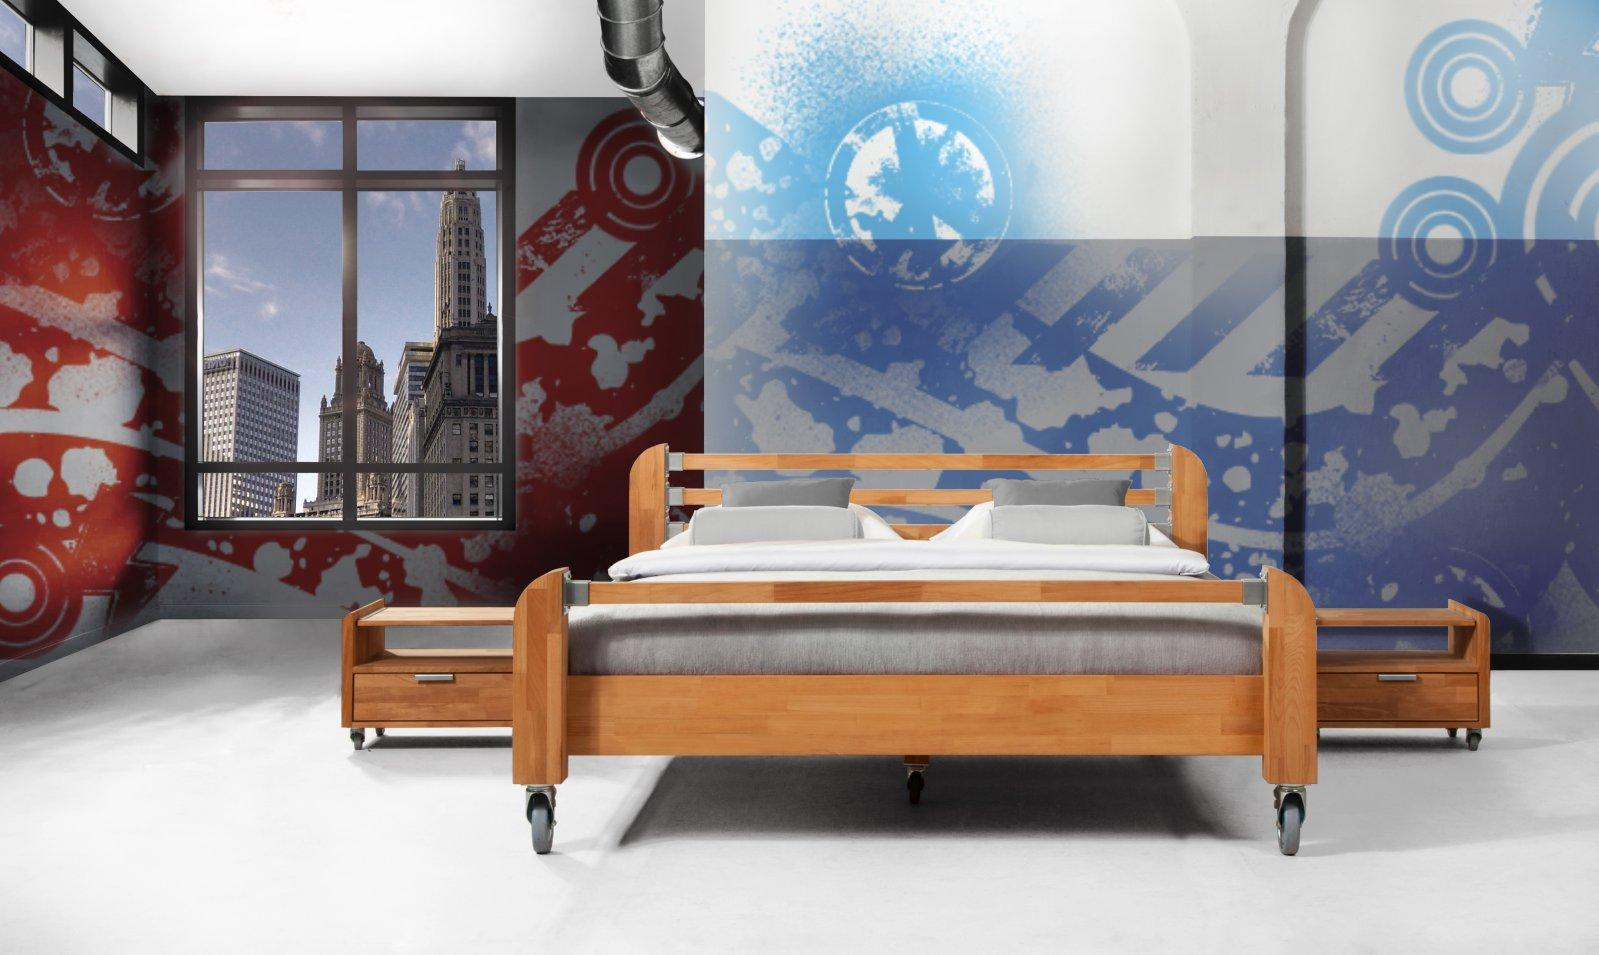 Łóżko HEAVY METAL na kołach z litego drewna